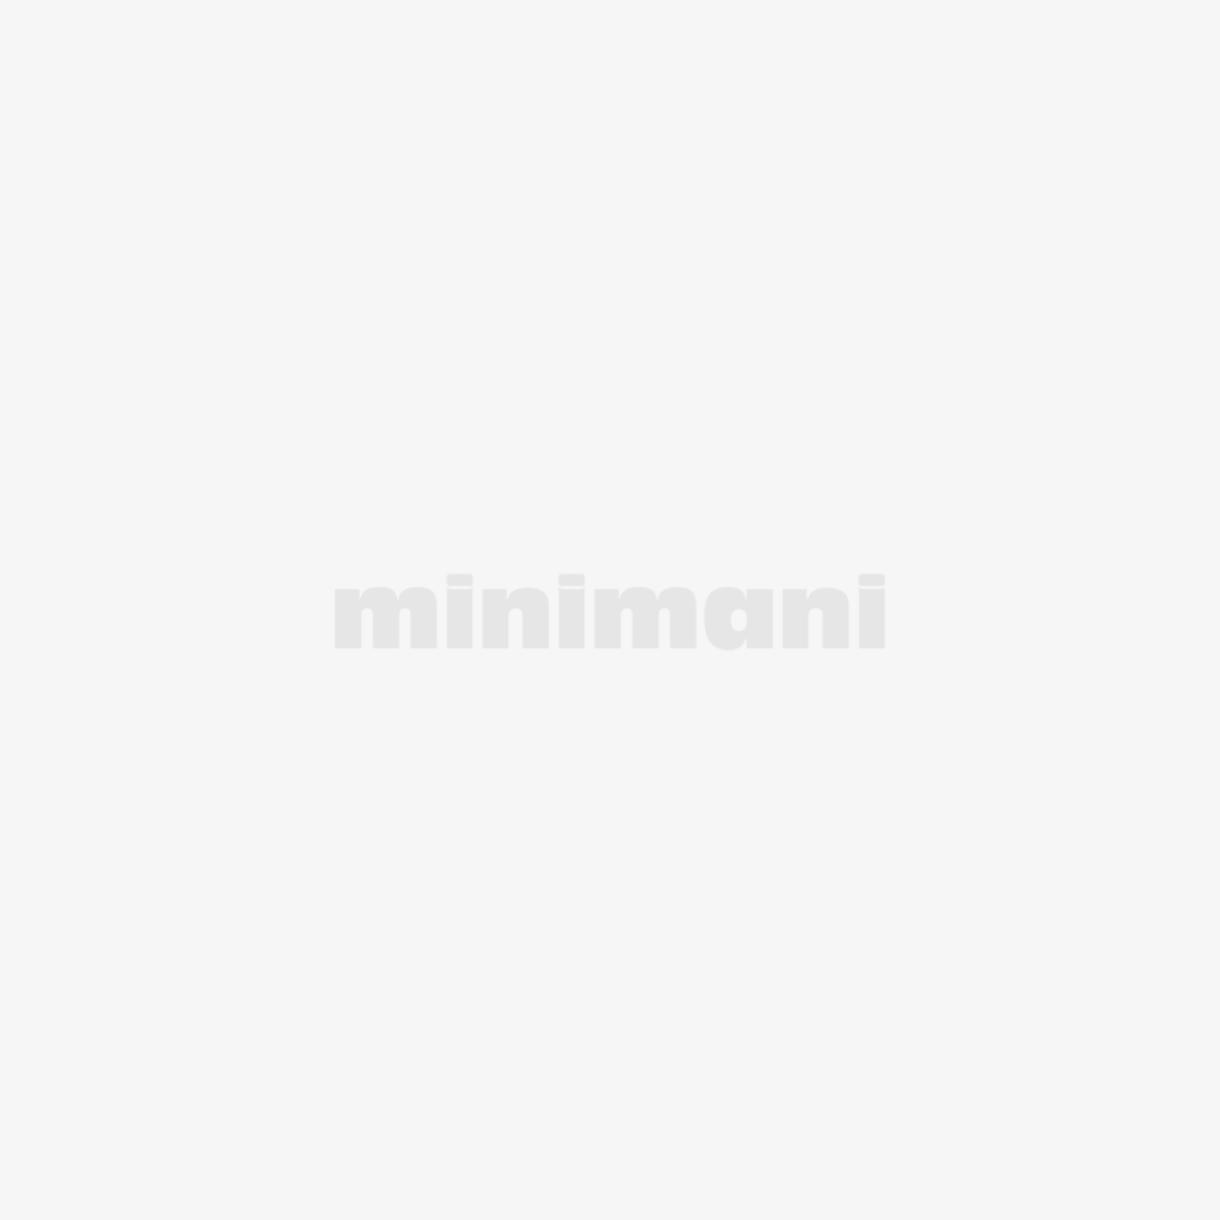 IITTALA TEEMA MUKI 0,3 L CELADONIN